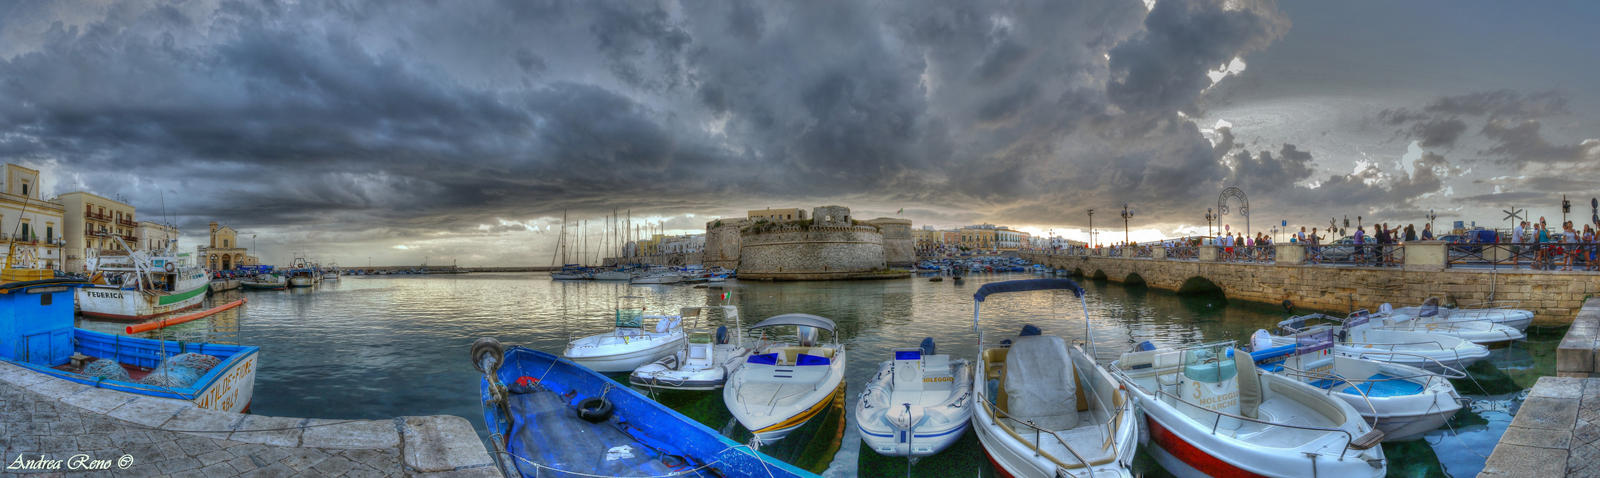 Gallipoli-Harbour